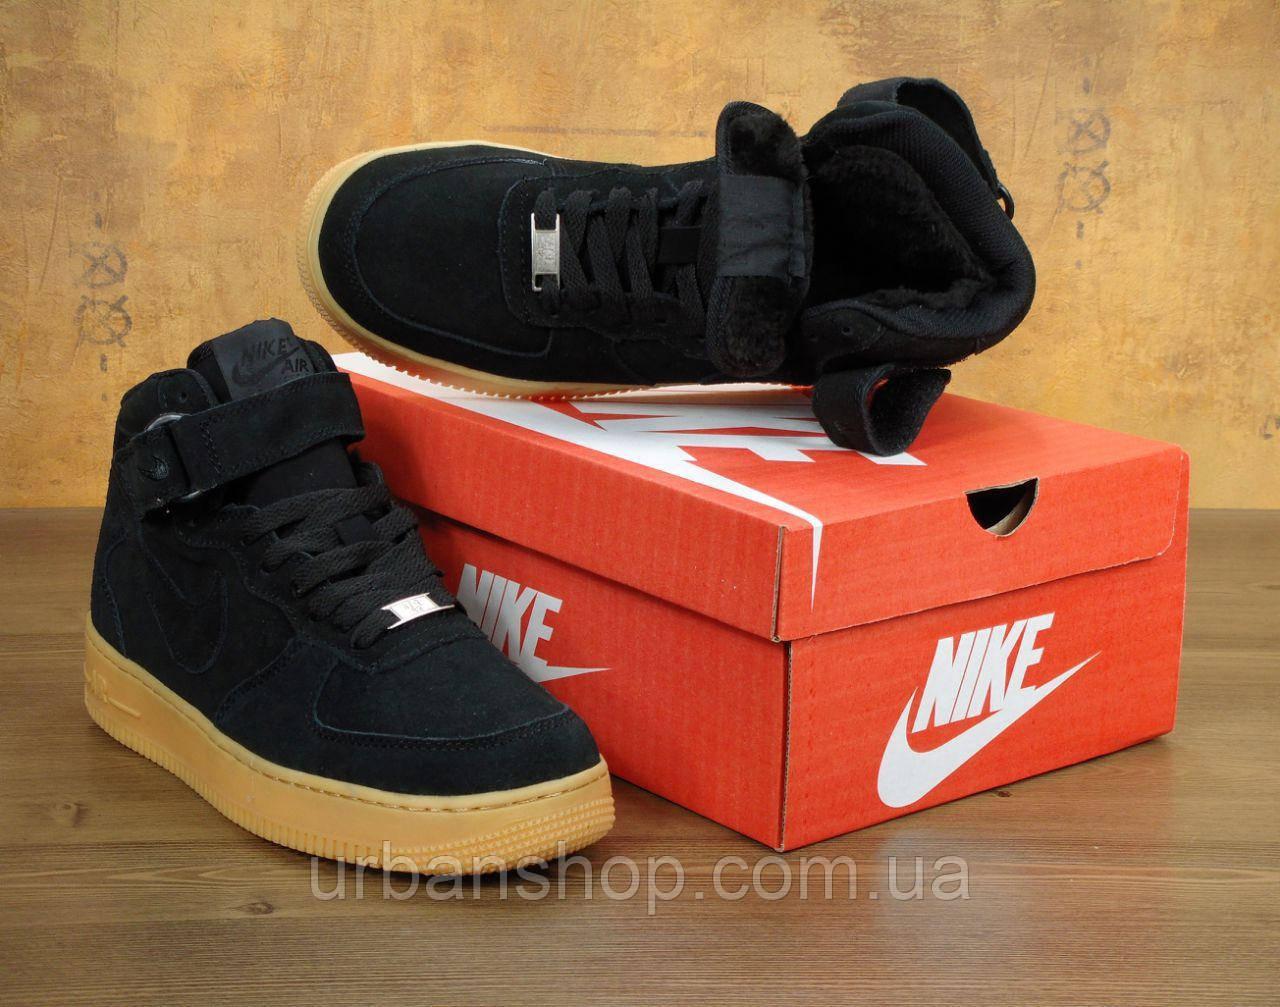 Зимние кроссовки Nike Air Force Black Suede Hi 40-45 рр